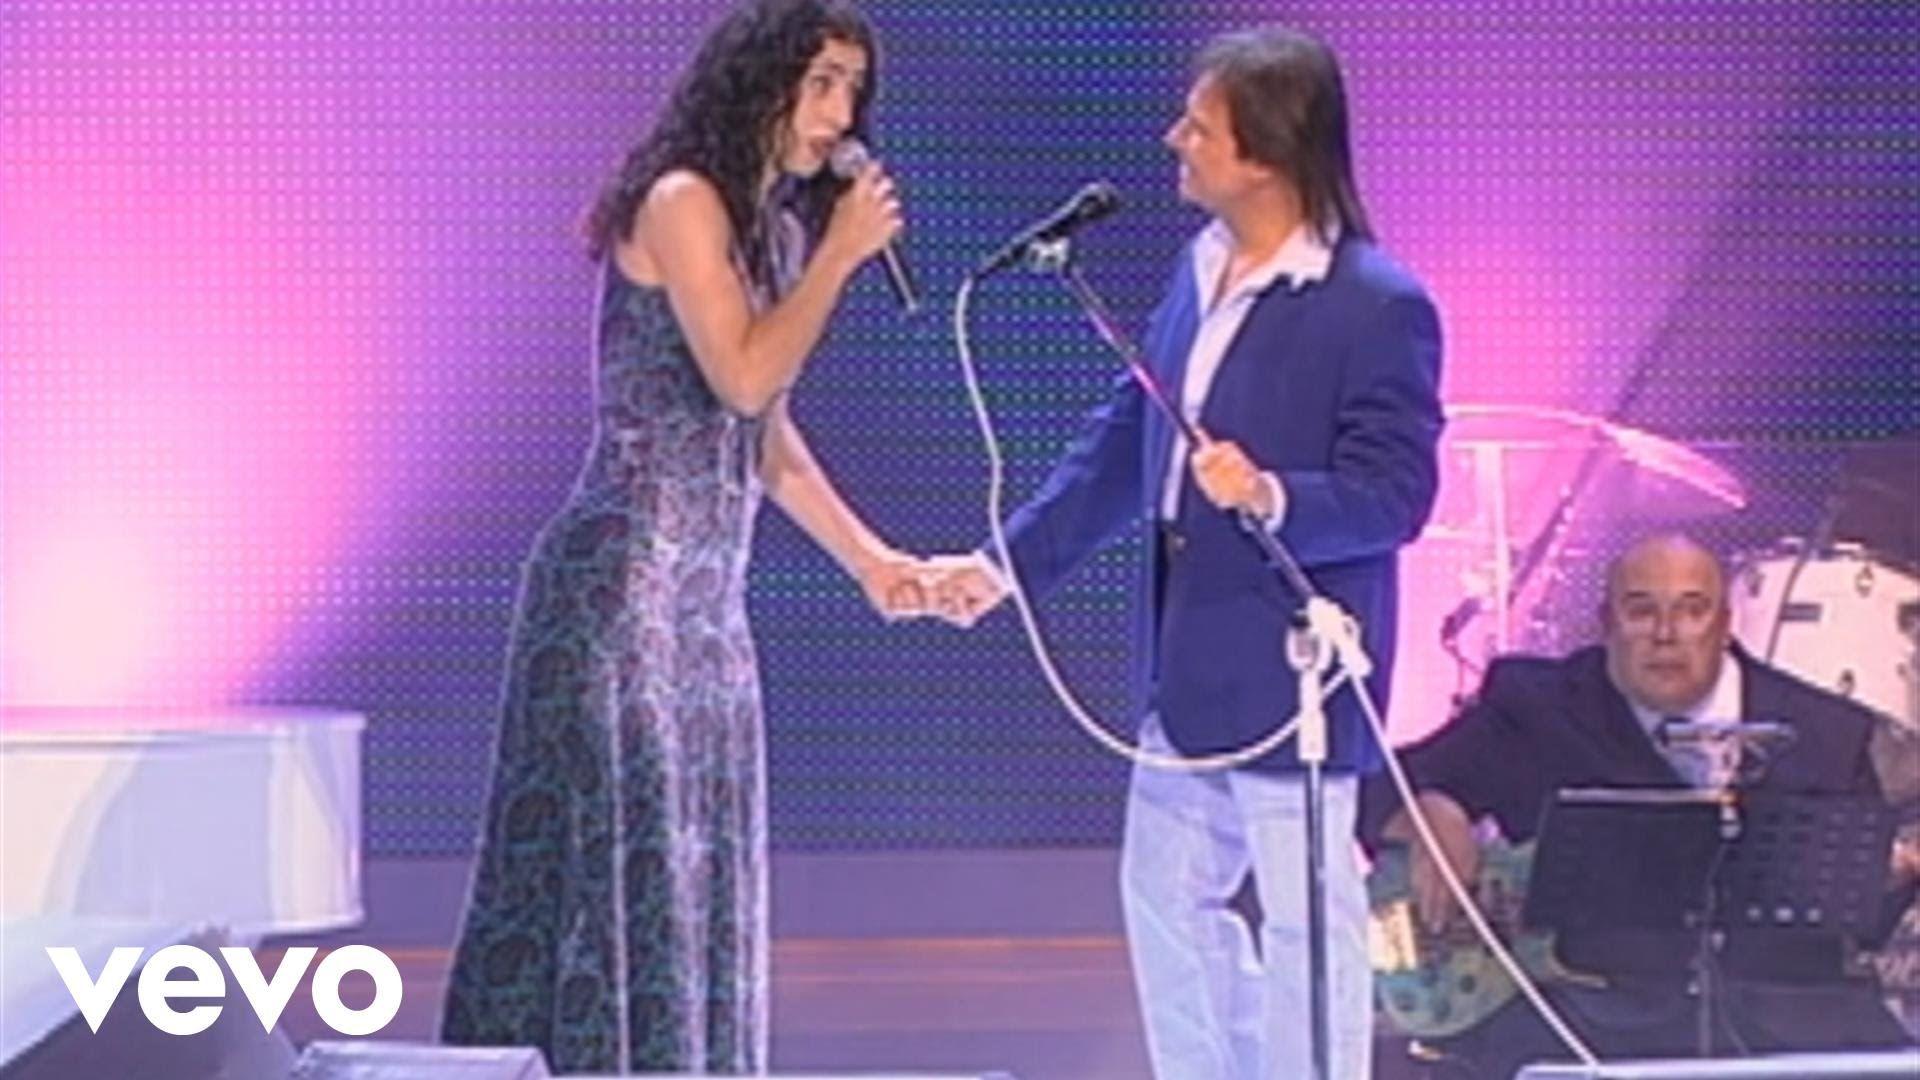 Roberto Carlos Amor I Love You Video Ao Vivo Ft Marisa Monte